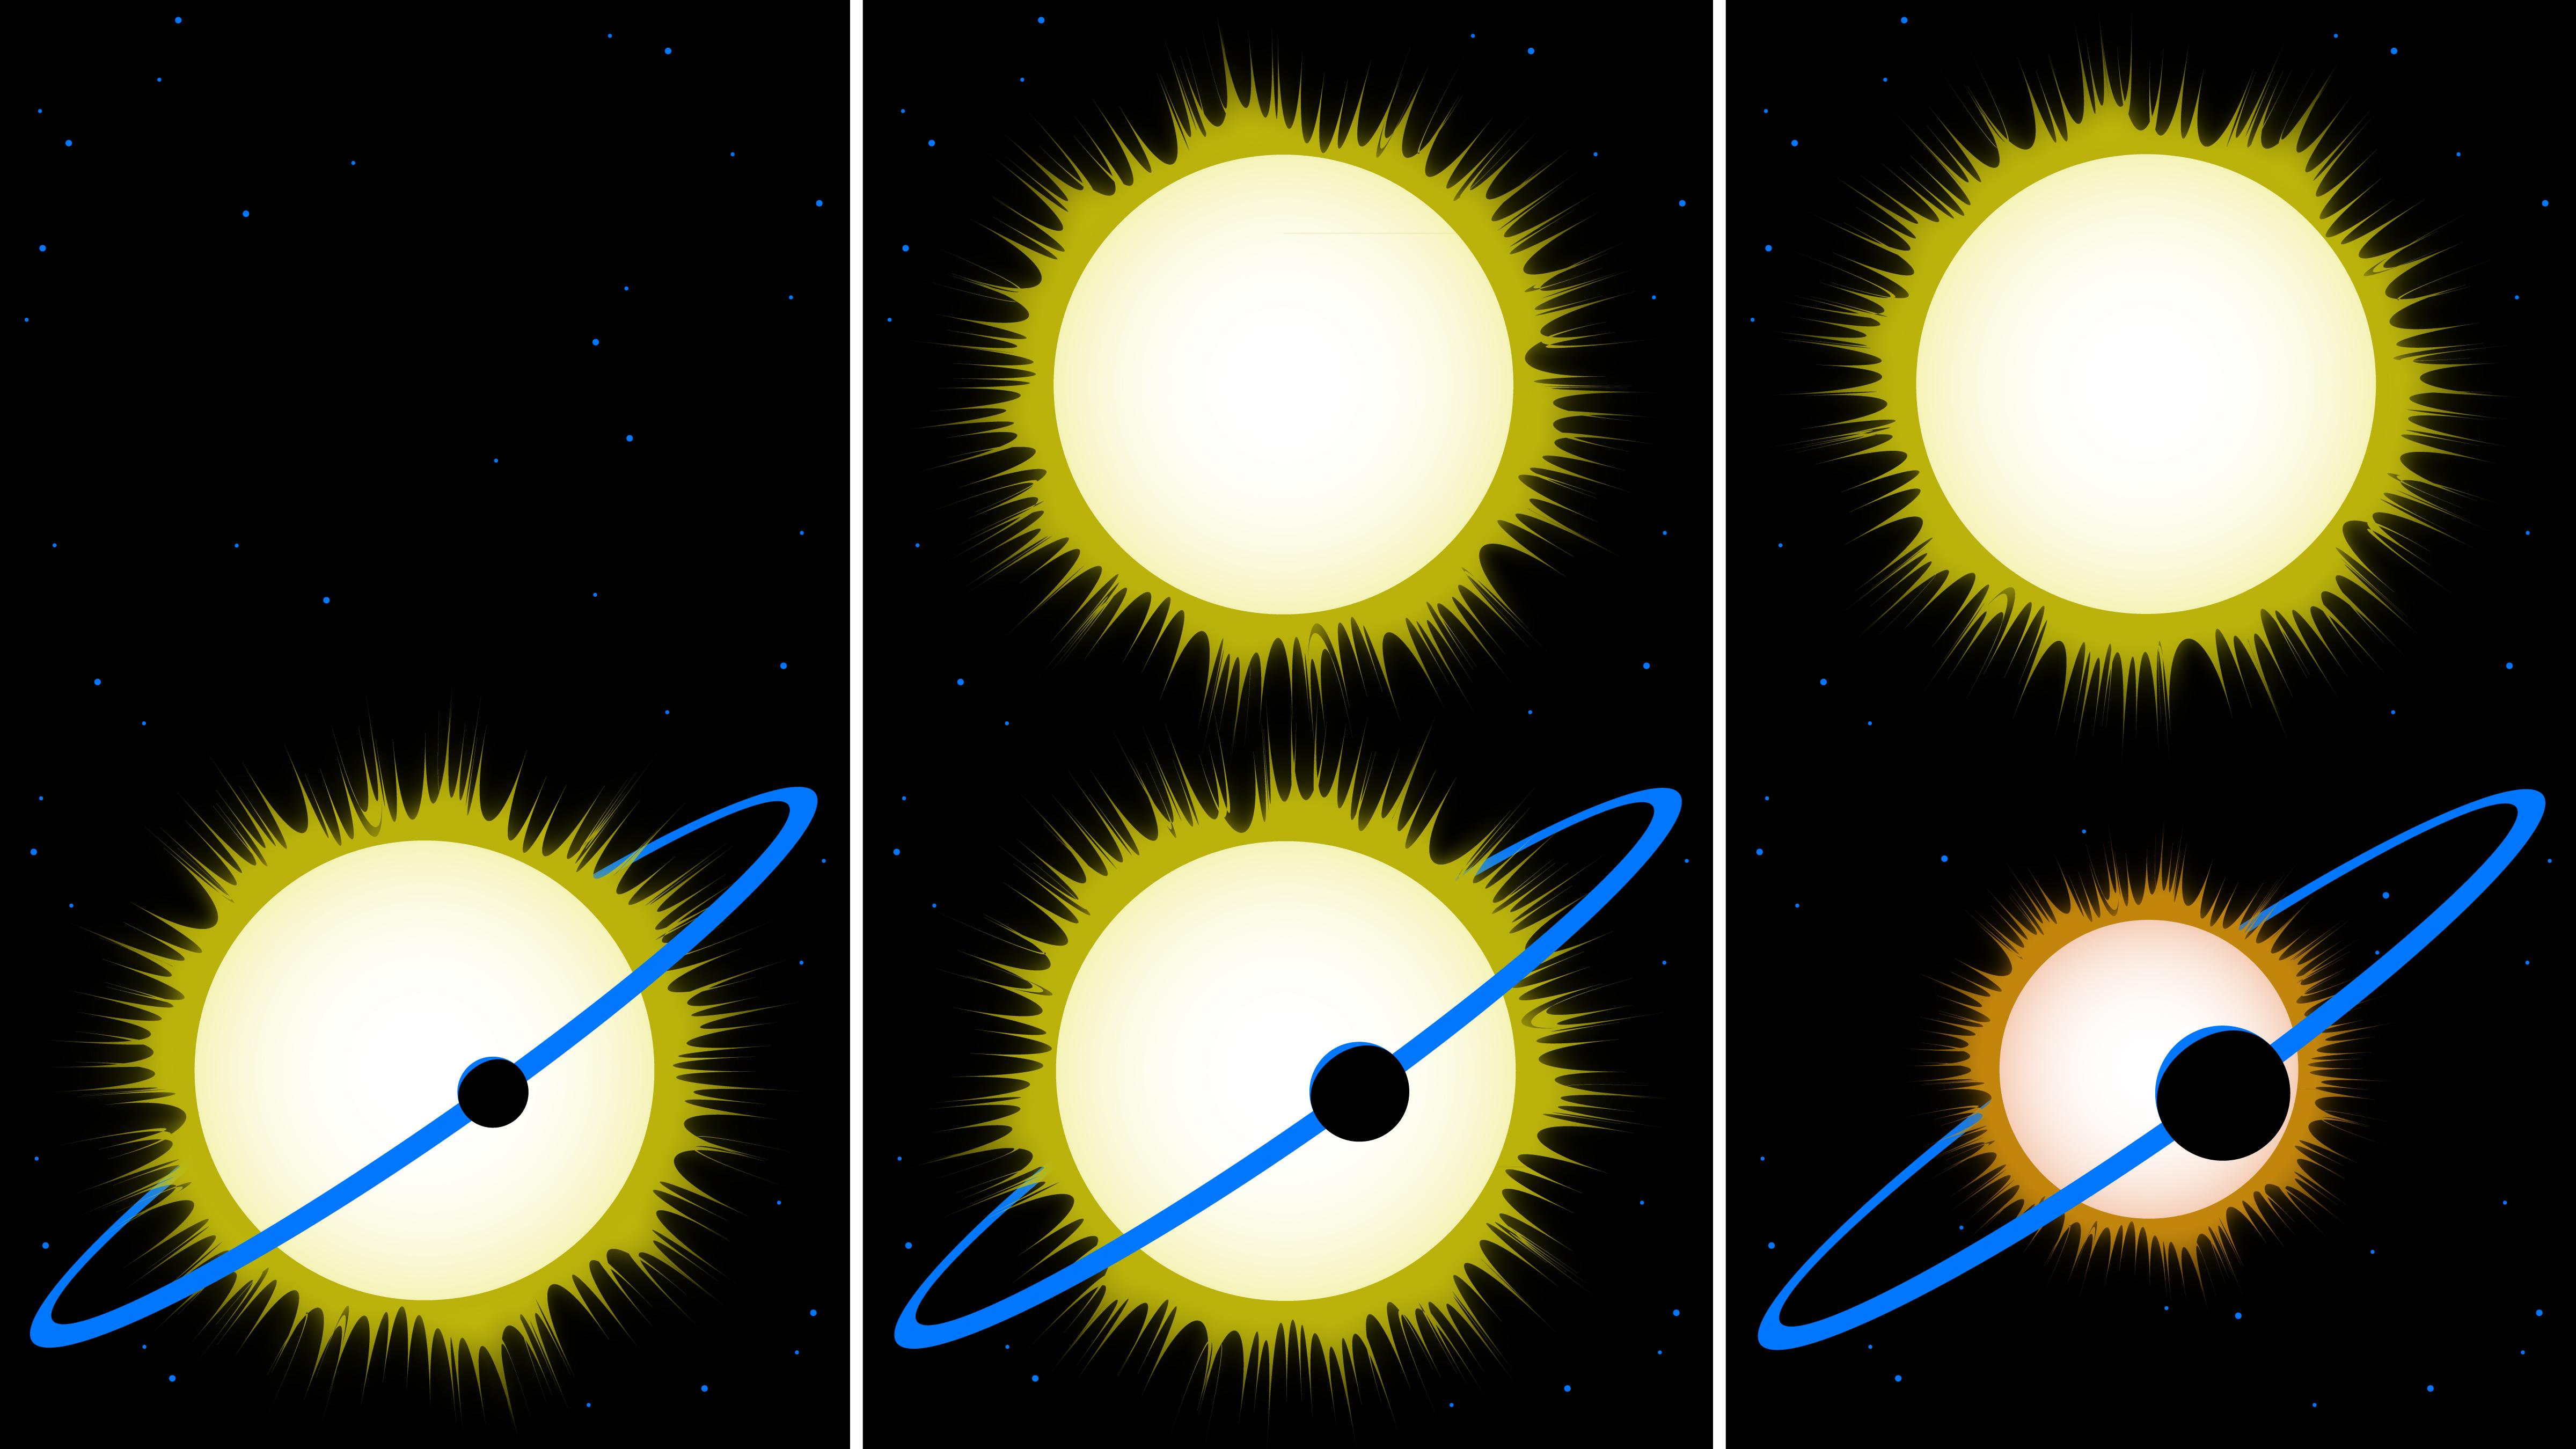 Hidden Stars May Make Planets Appear Smaller